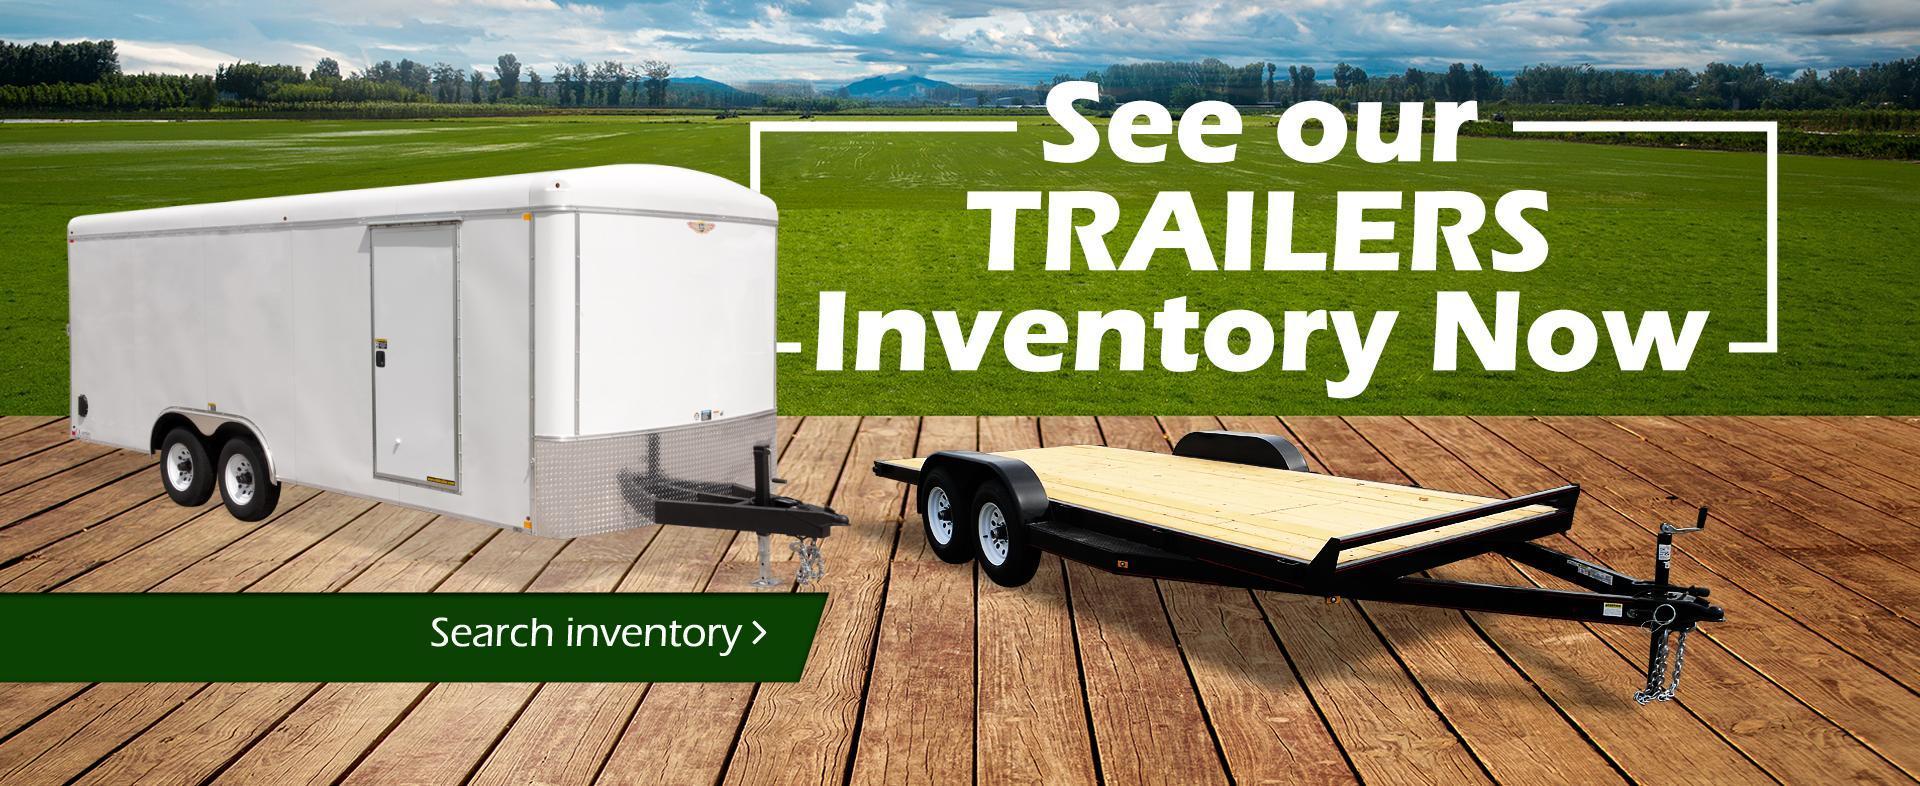 Trailer Inventory Guay's garage